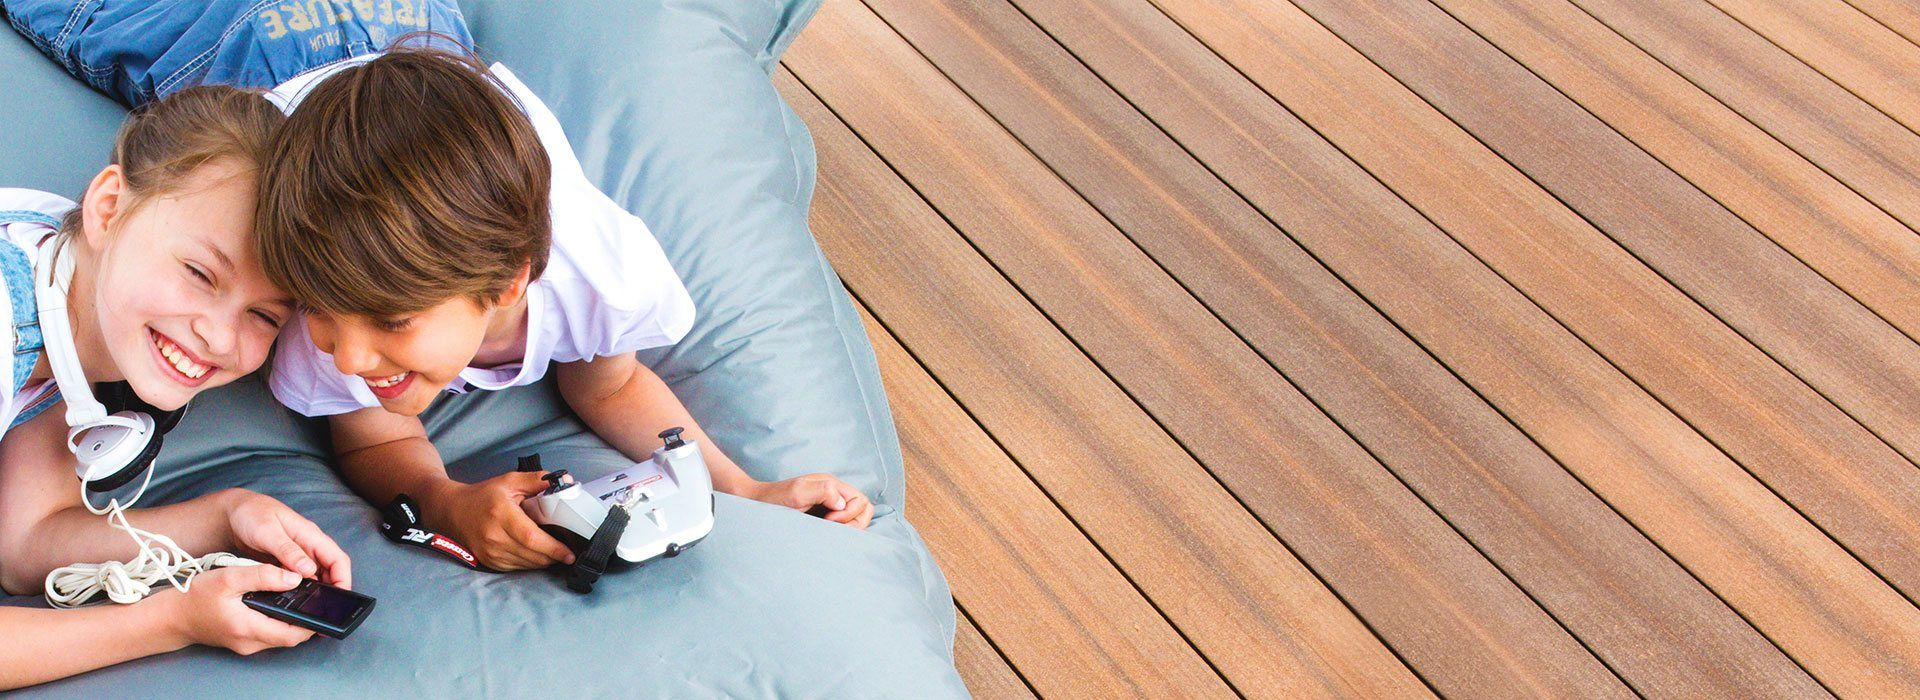 Megawood Terrassendielen Komplettset WPC Komplettbausatz Premium XXL grau Holz